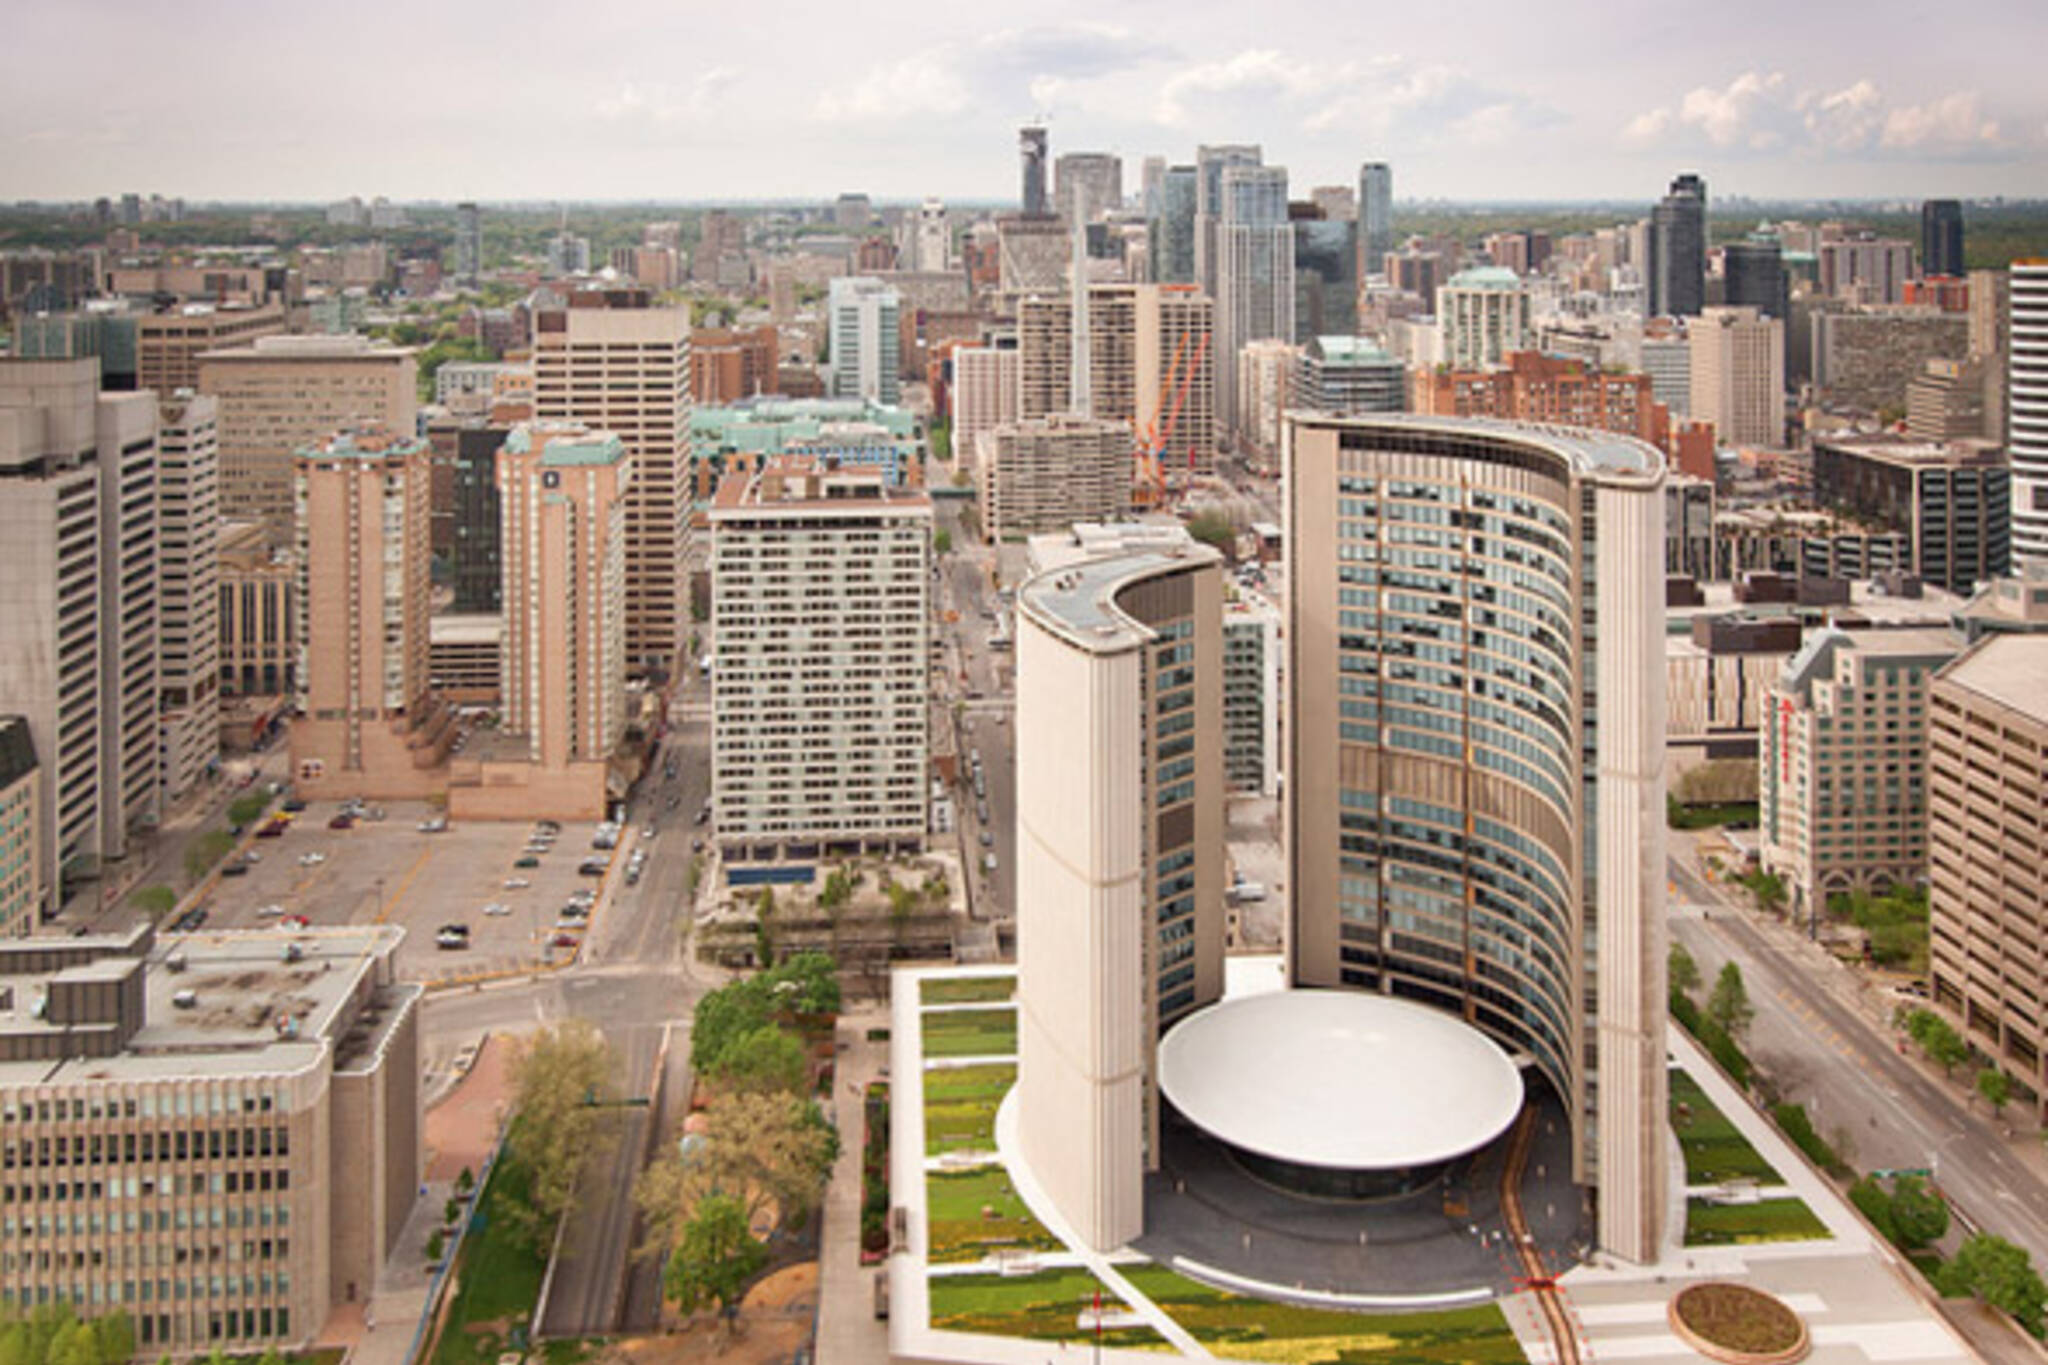 City of Toronto Buyout